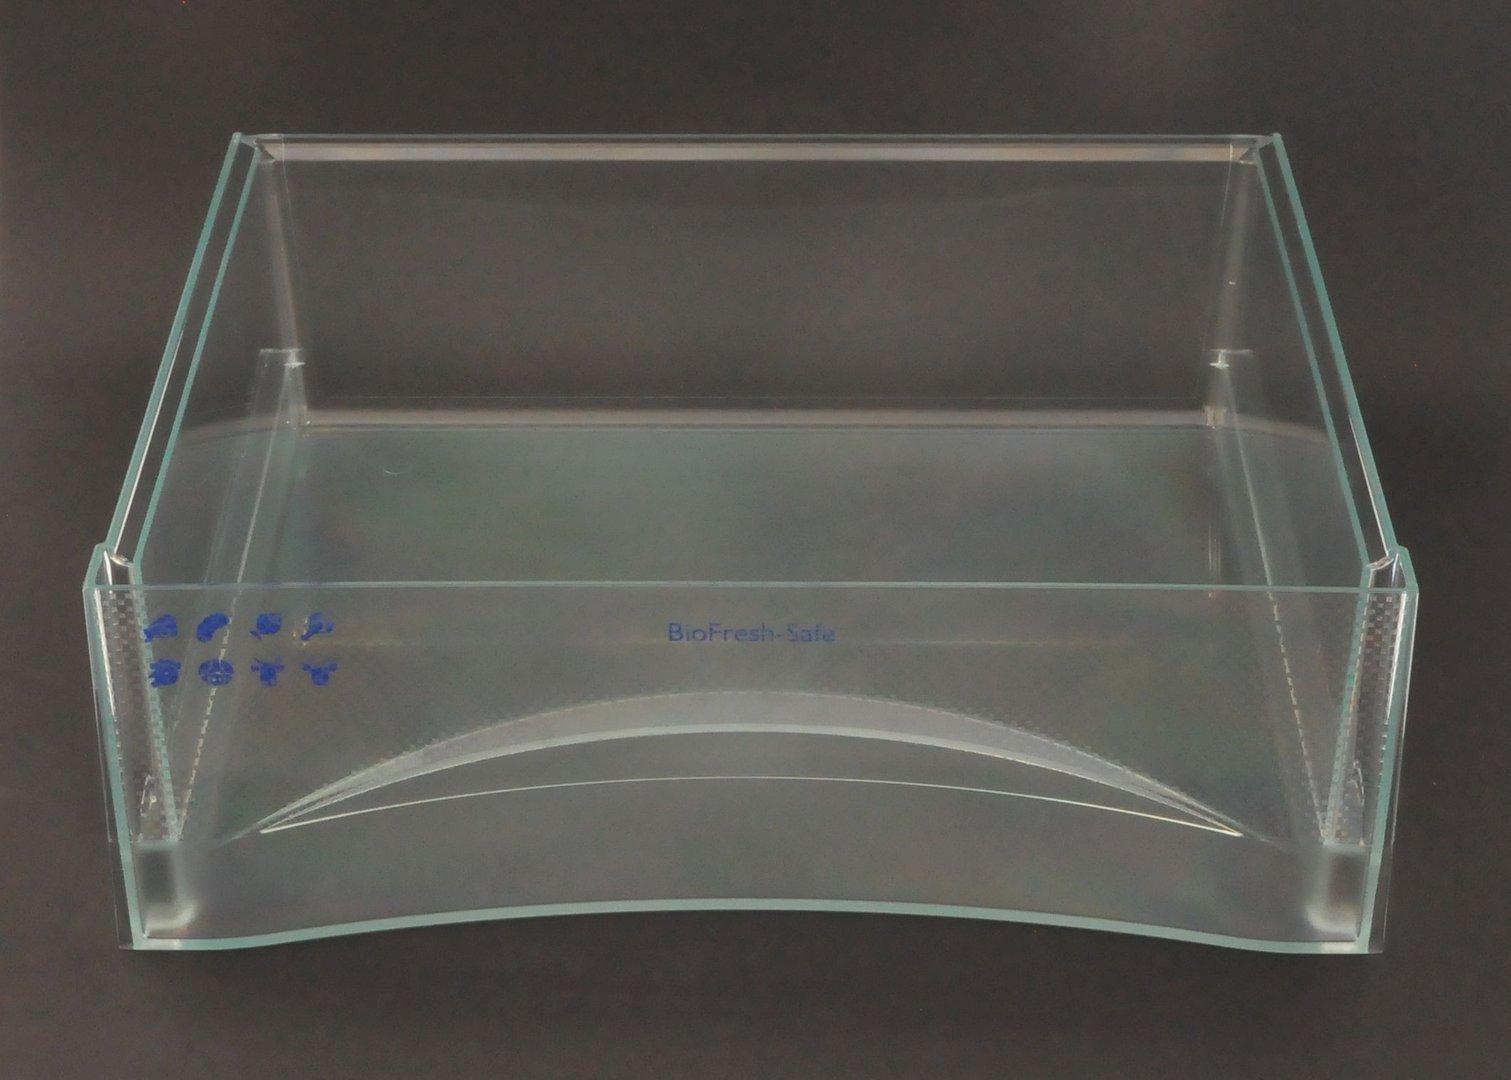 liebherr biofresh safe schublade gem seschale k hlschrank 9791272. Black Bedroom Furniture Sets. Home Design Ideas